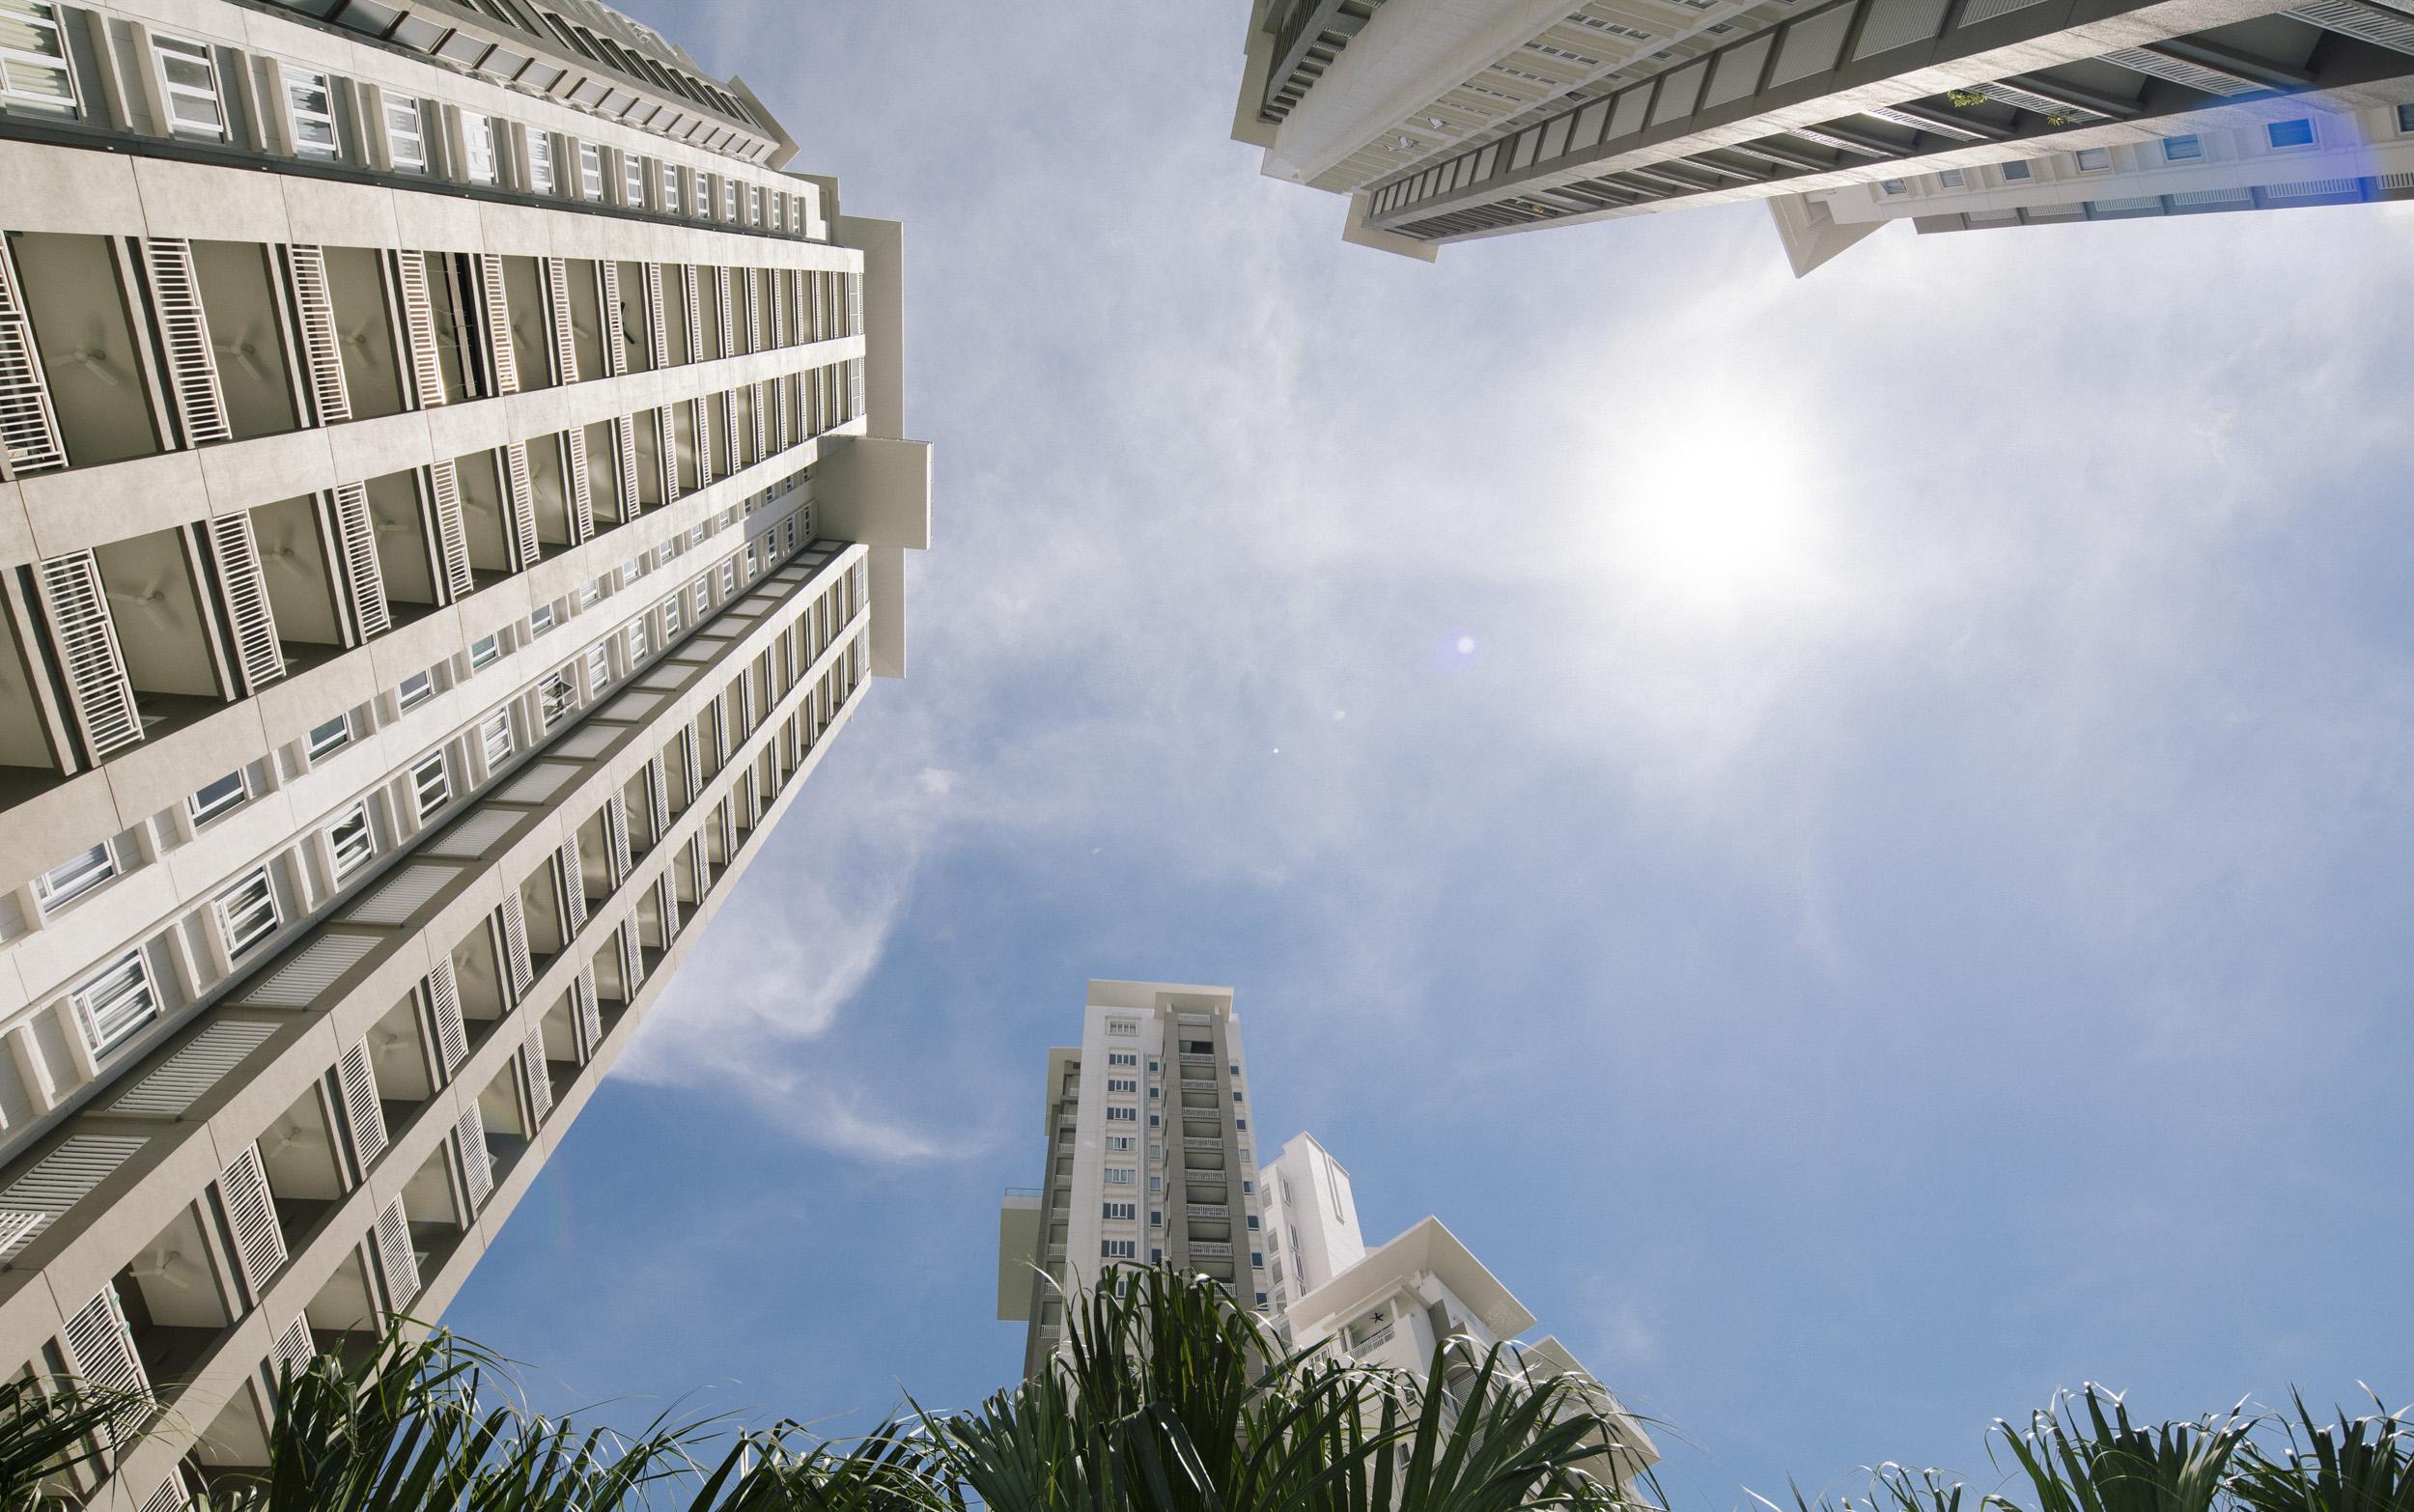 architecture_photography_sydney_australia_44.jpg